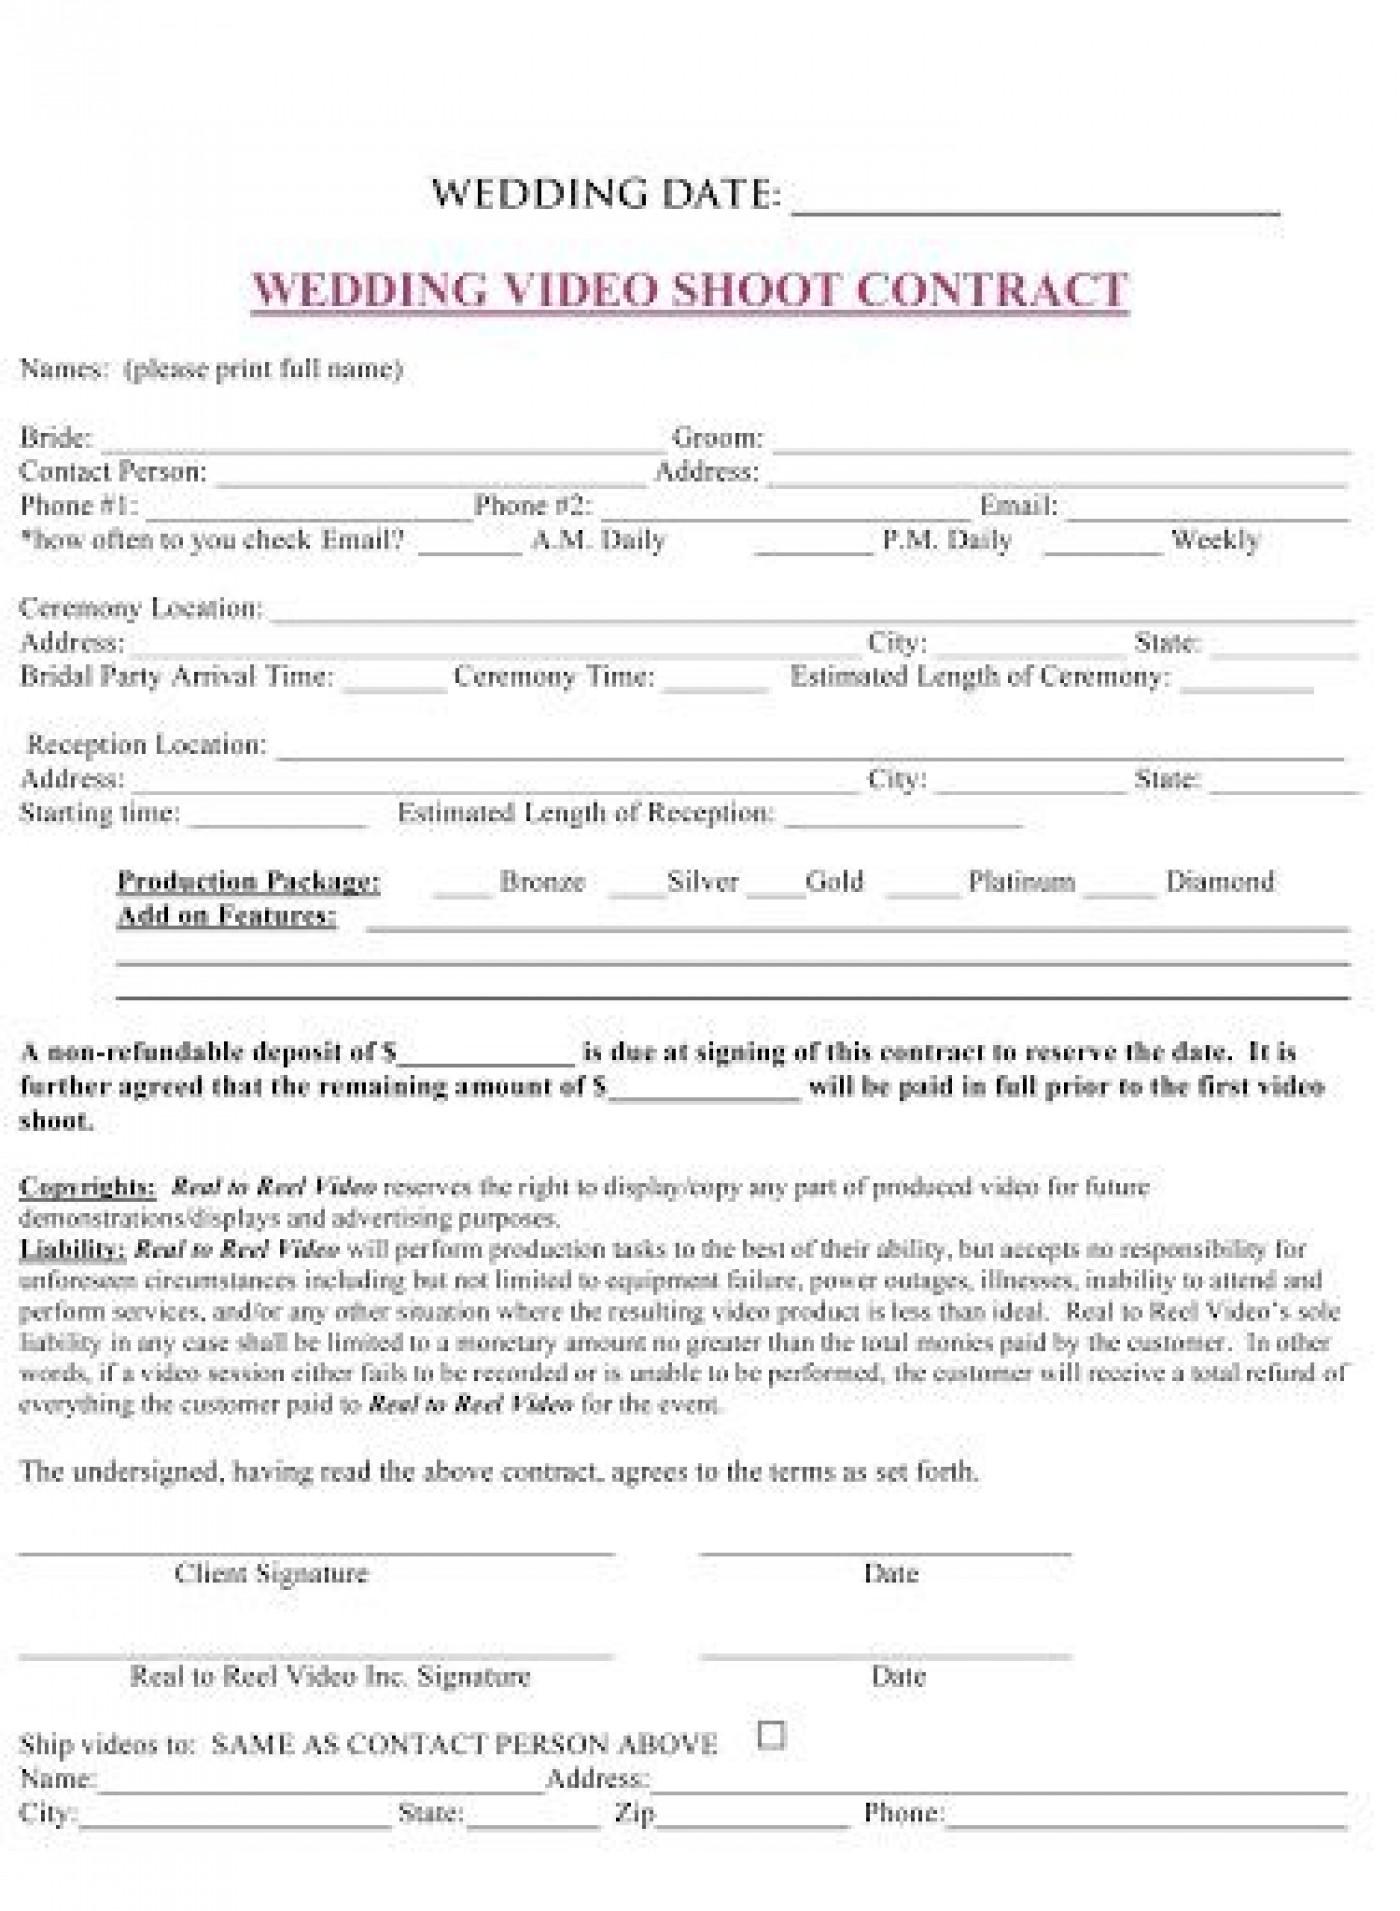 009 Top Wedding Planner Contract Template Highest Quality  Uk Australia1400